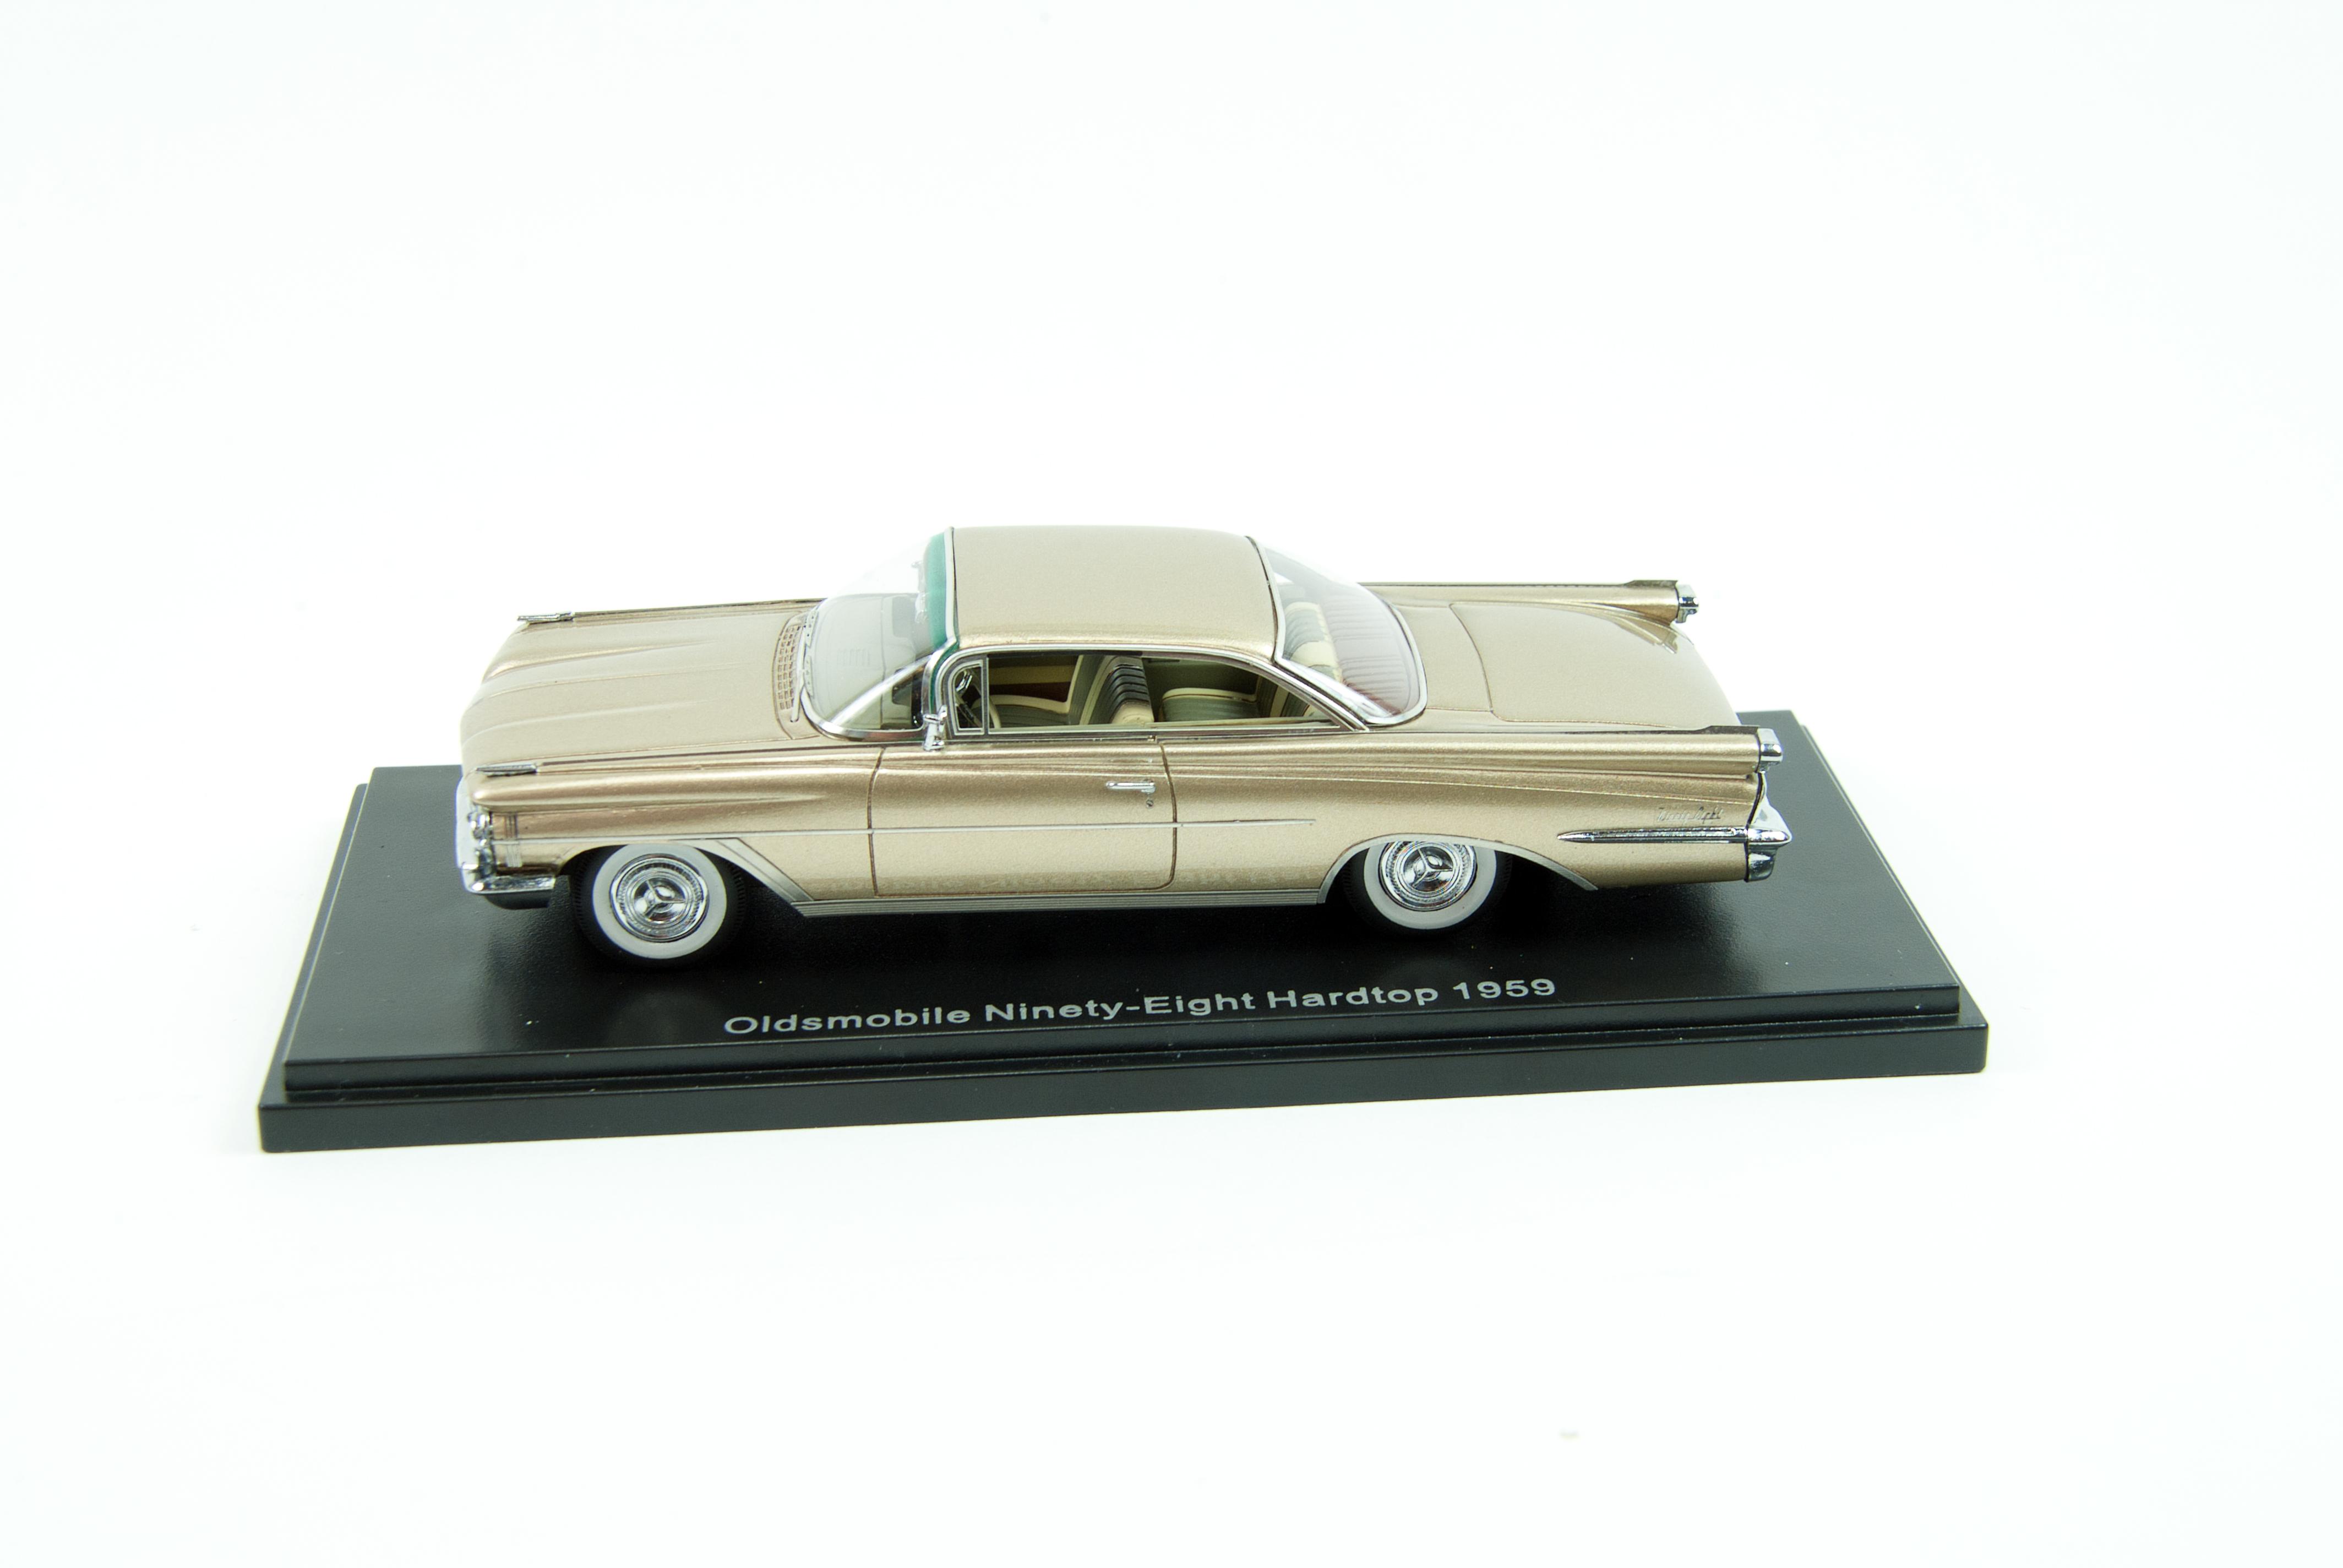 Neos 1959 Oldsmobile Ninety Eight Hardtop Savage On Wheels